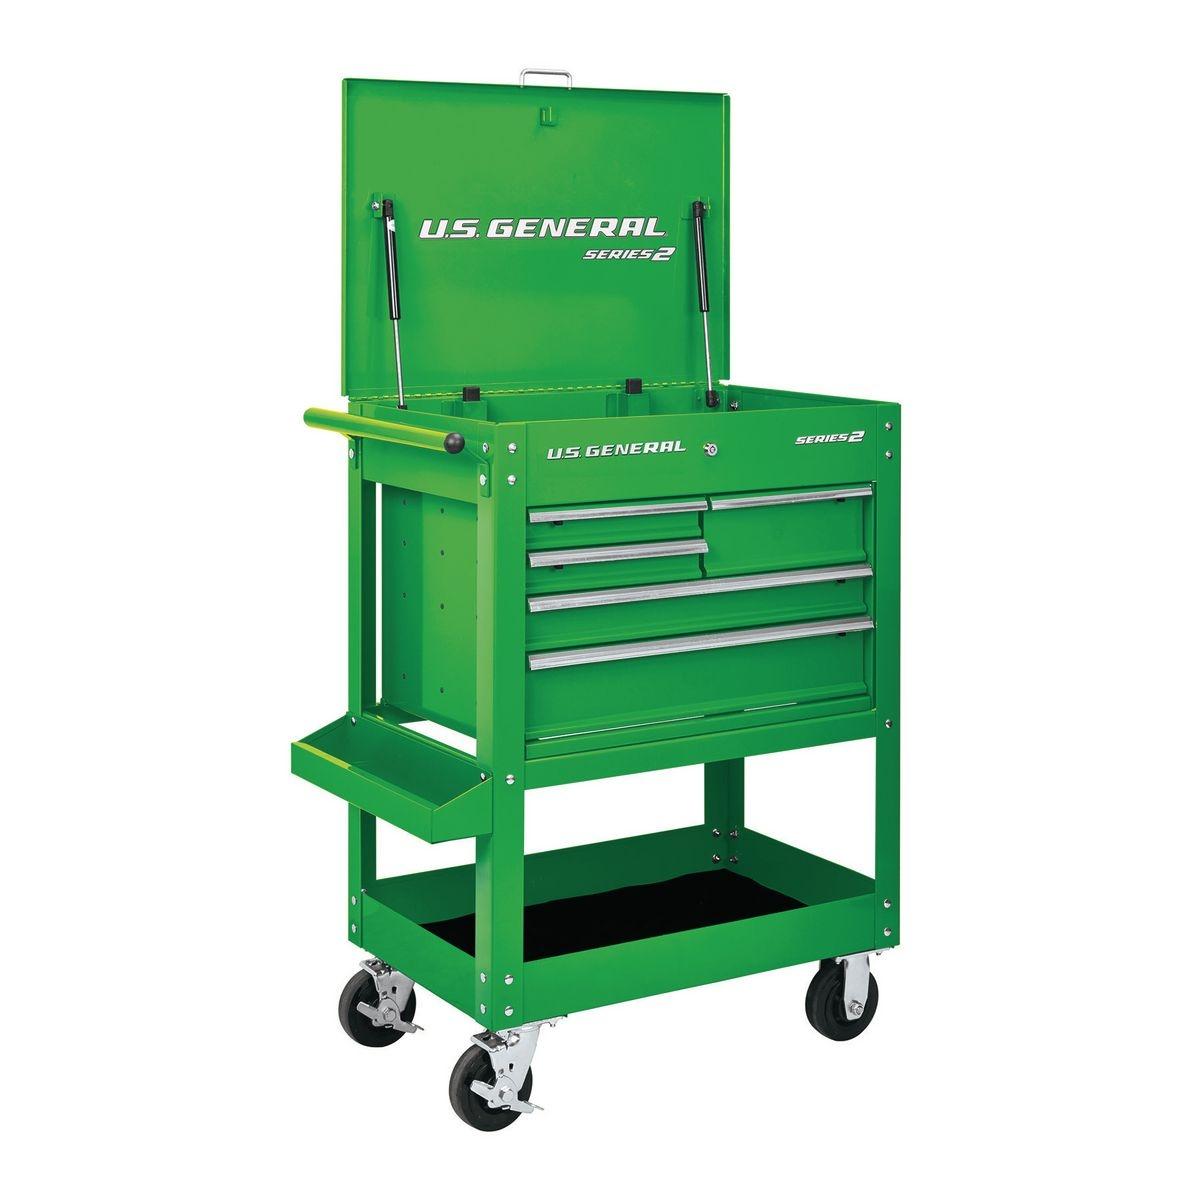 U.S. GENERAL 30 In. 5 Drawer Mechanic's Cart - Green - Item 64721 / 56237